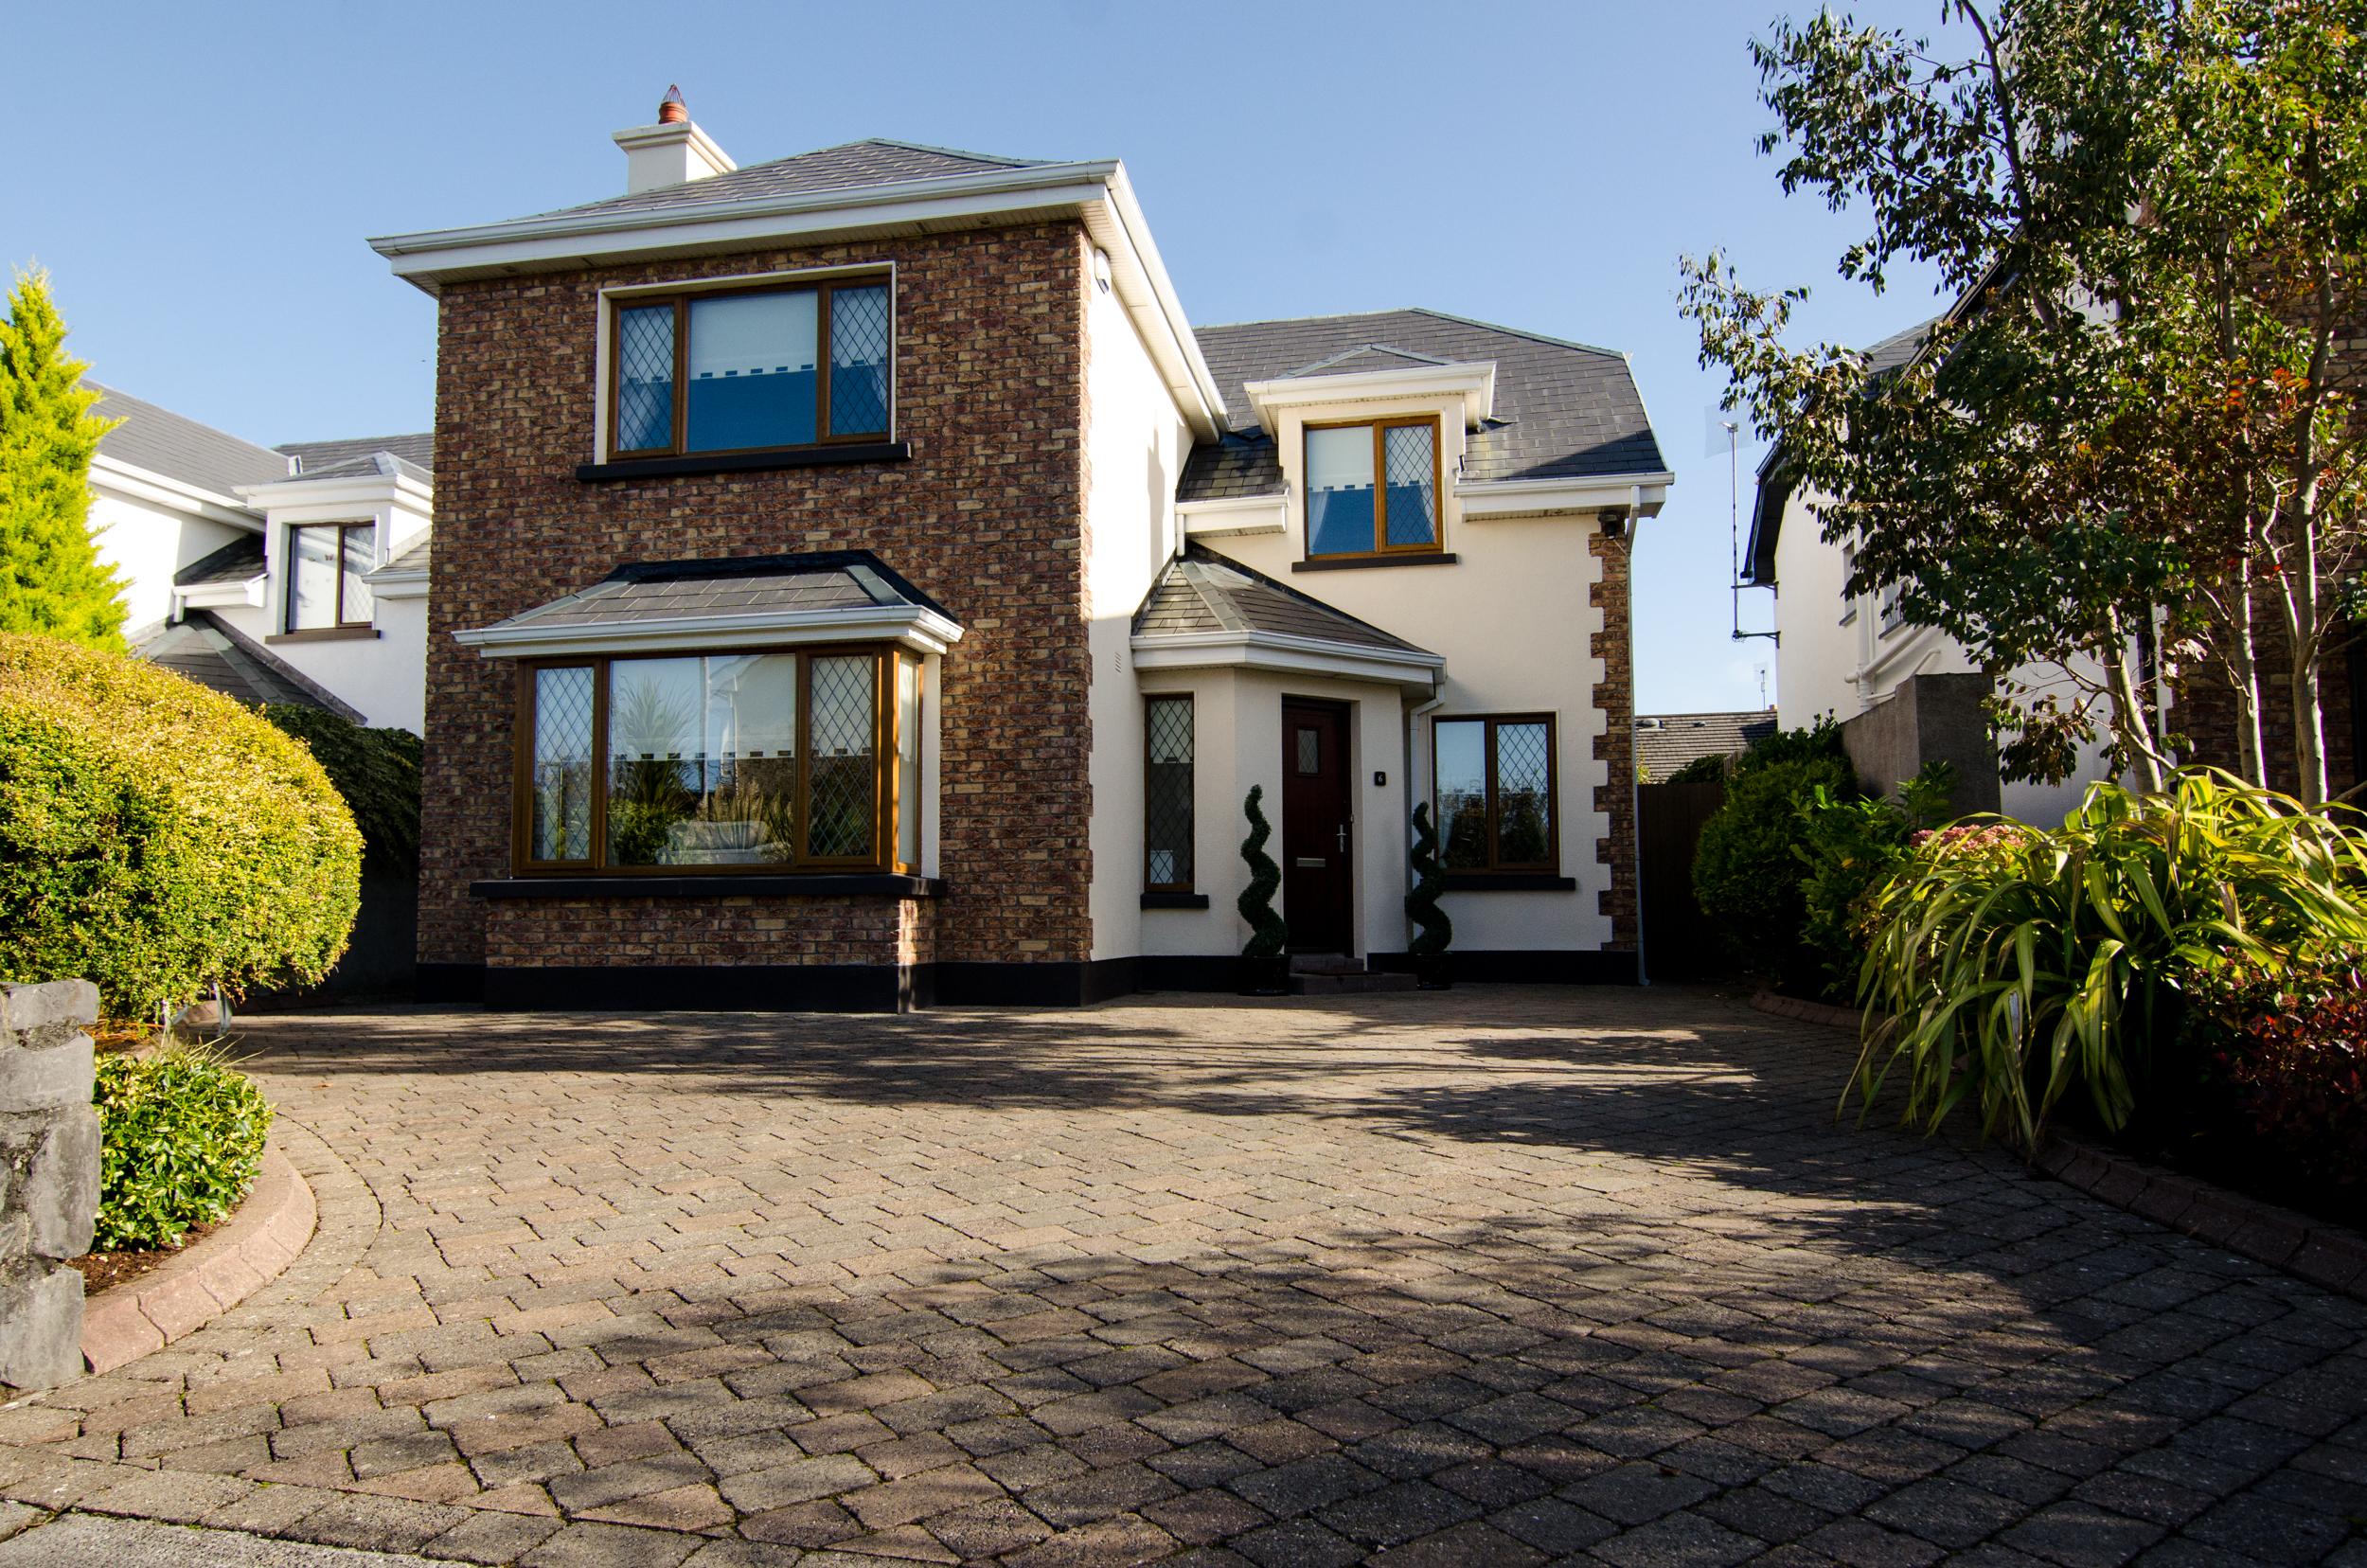 6 Oranvale, Bog Road, Oranmore, Co. Galway